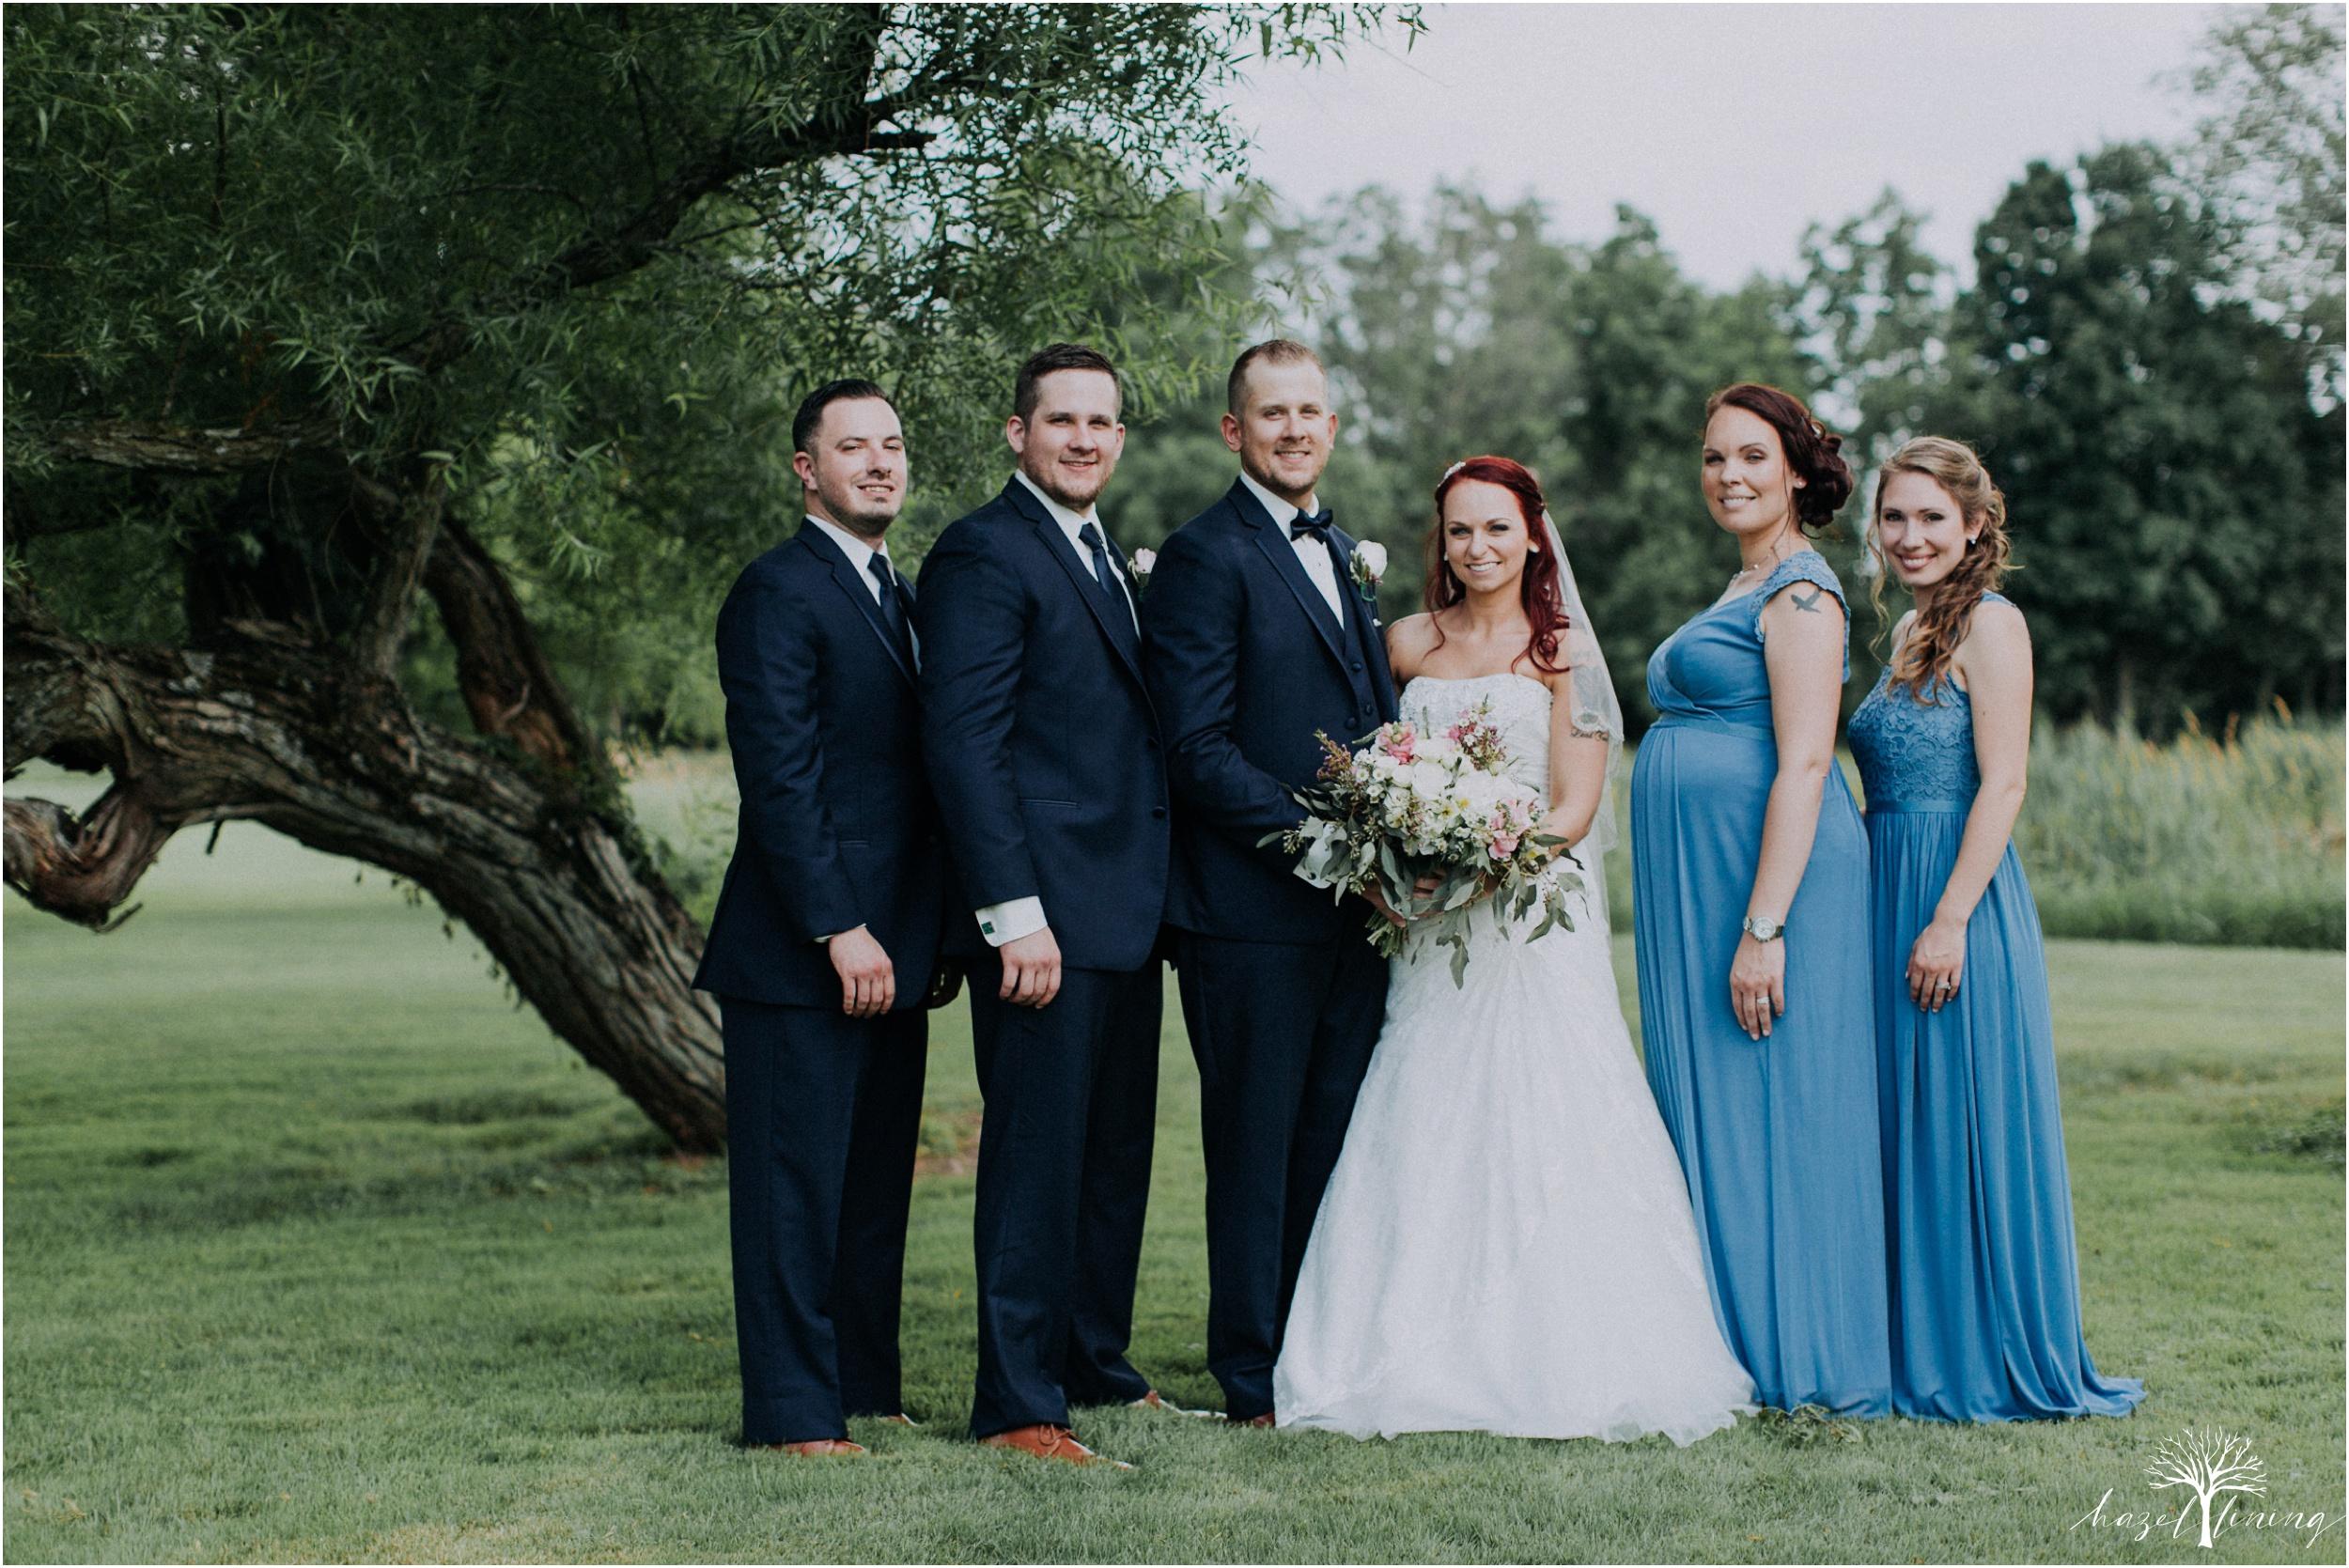 alyssa-james-stiteler-wedding-loft-and-sweet-water-cc-pennsburg-pennsylvania-hazel-lining-travel-wedding-elopement-photography_0065.jpg